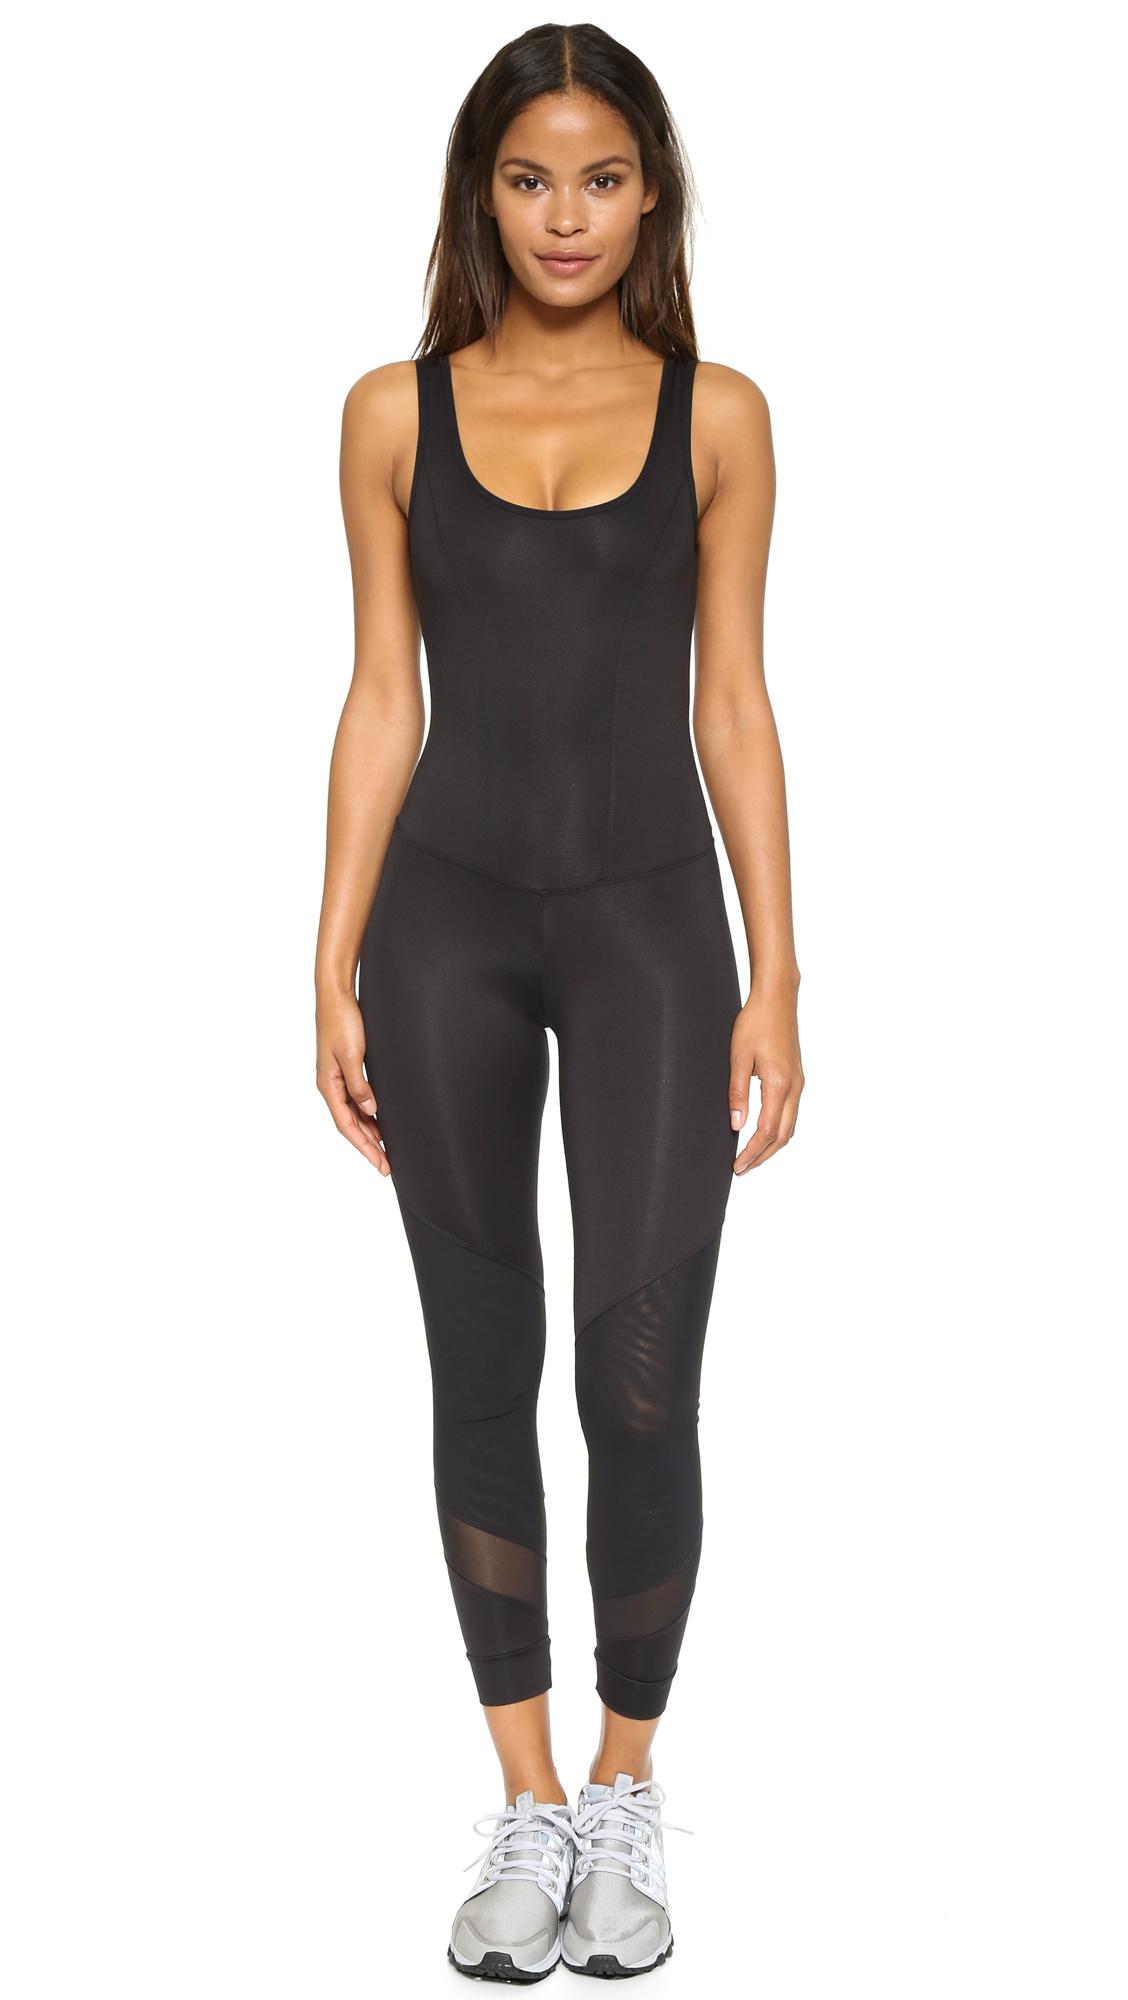 KORAL ACTIVEWEAR Vector Jumpsuit - Black